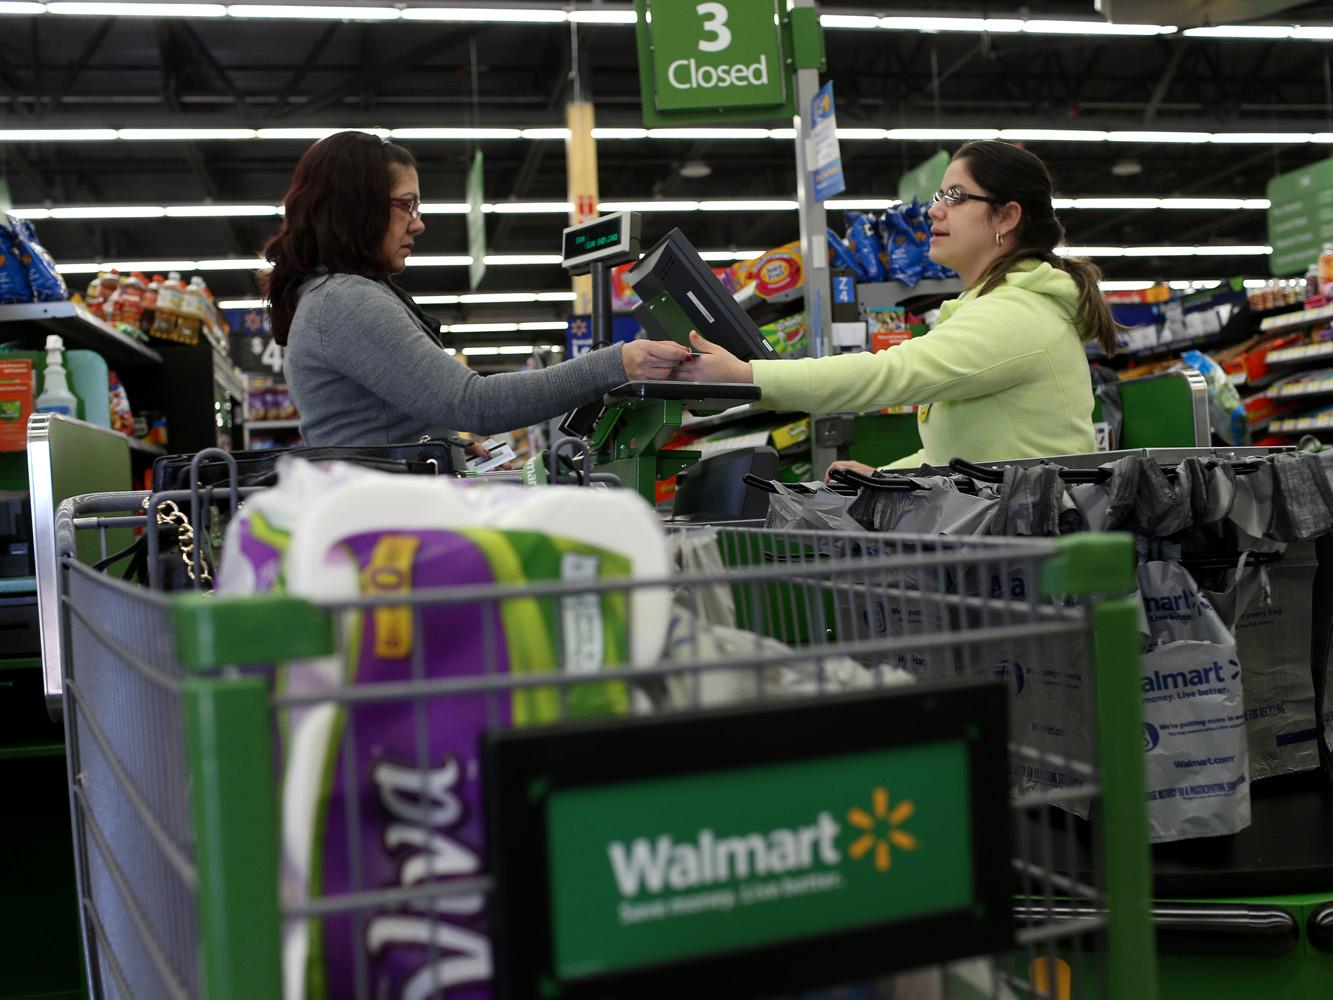 Walmart's customers are too broke to shop